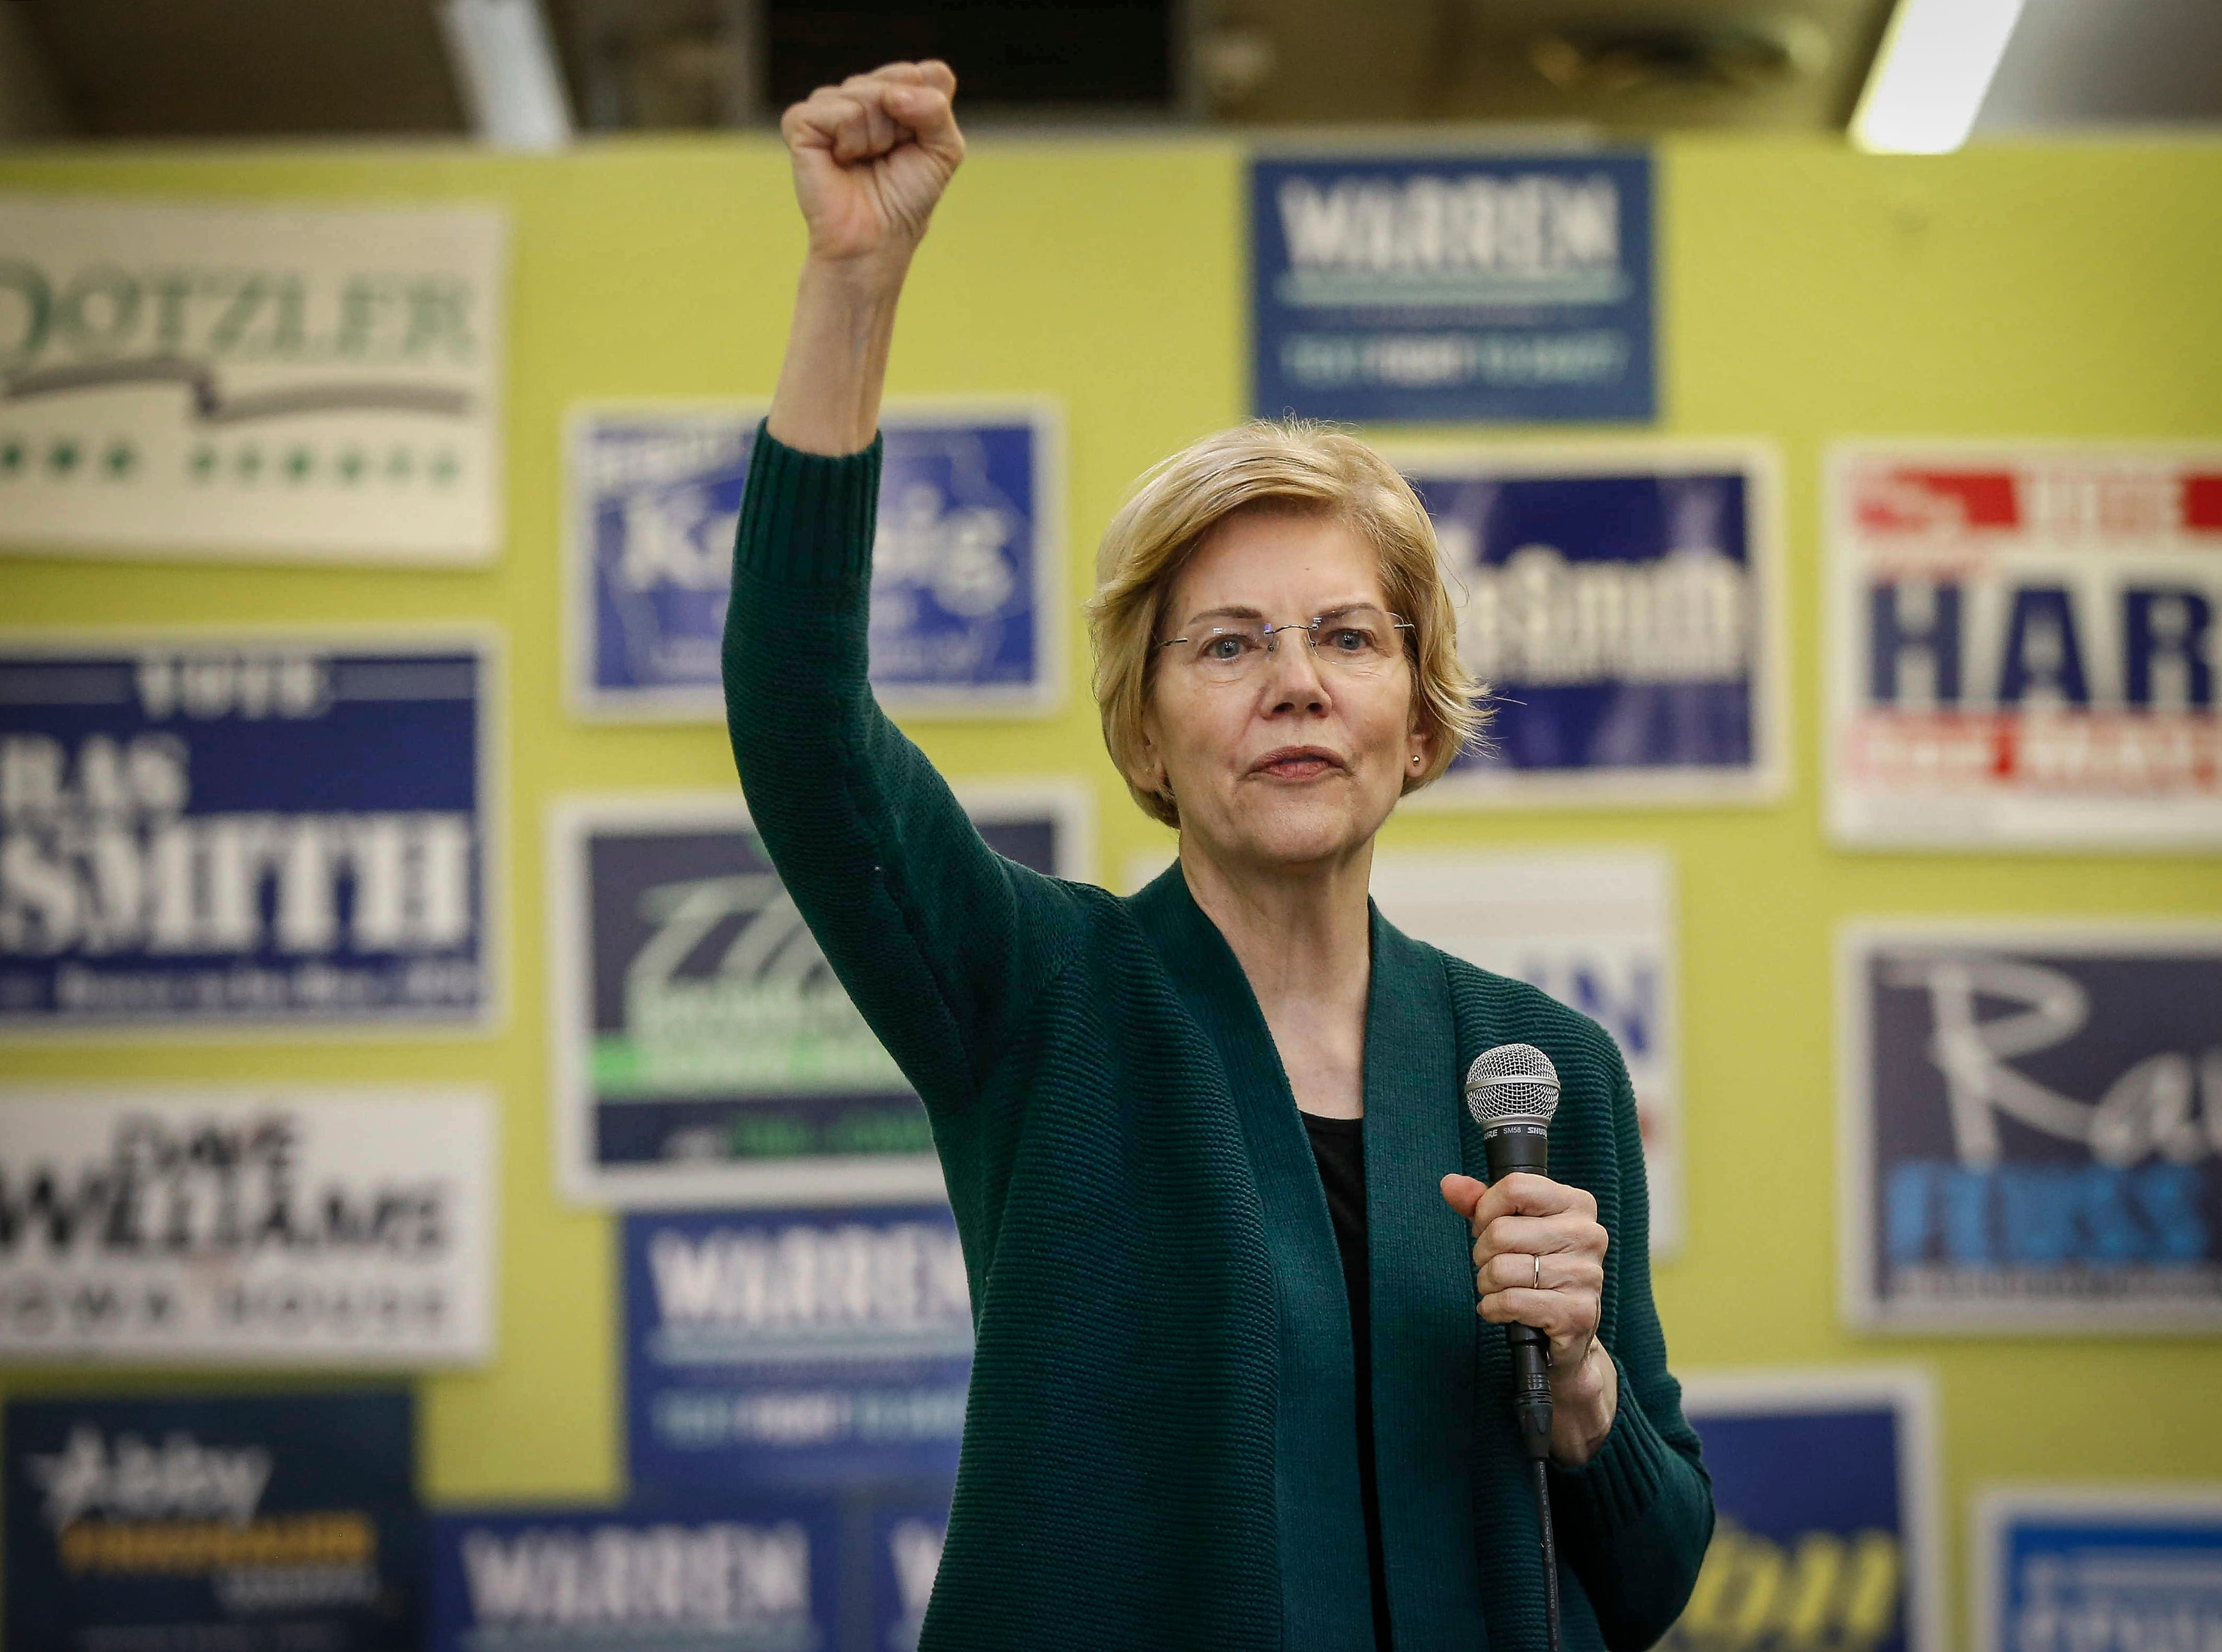 Democratic presidential hopeful Elizabeth Warren speaks to supporters at the Black Hawk Democratic headquarters in Waterloo on Saturday, March 2, 2019.